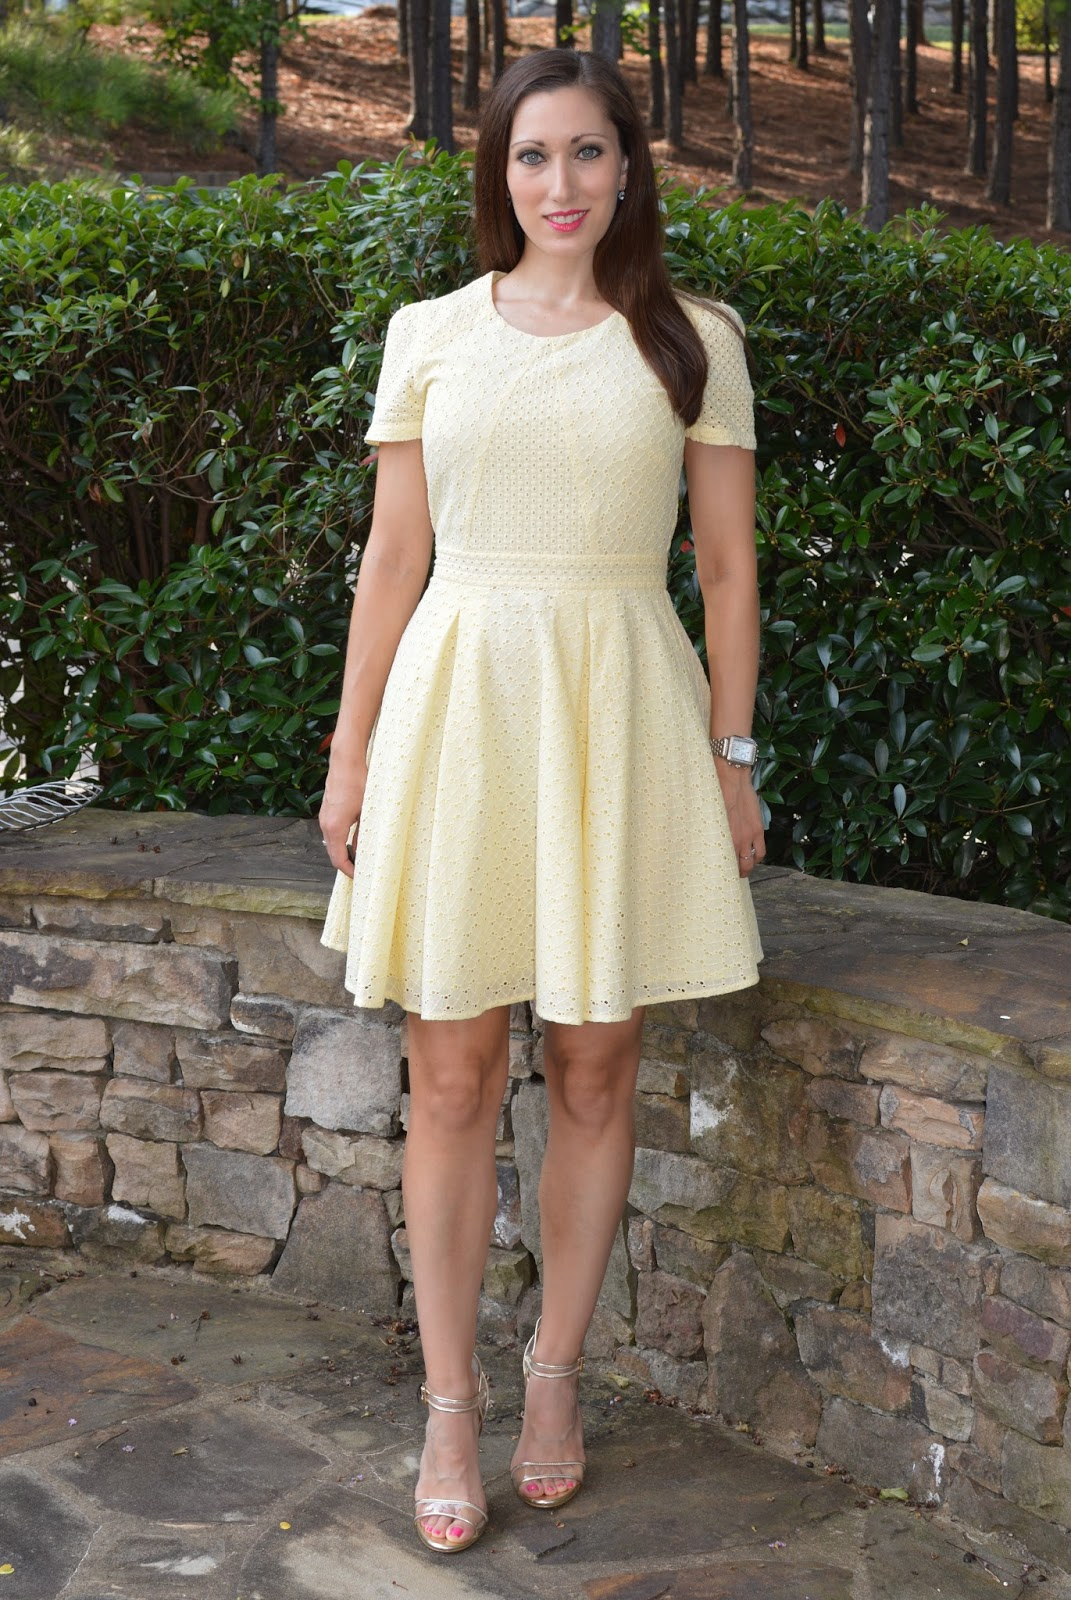 Everyday Fashionista - Atlanta Blogger: Eyelet Summer